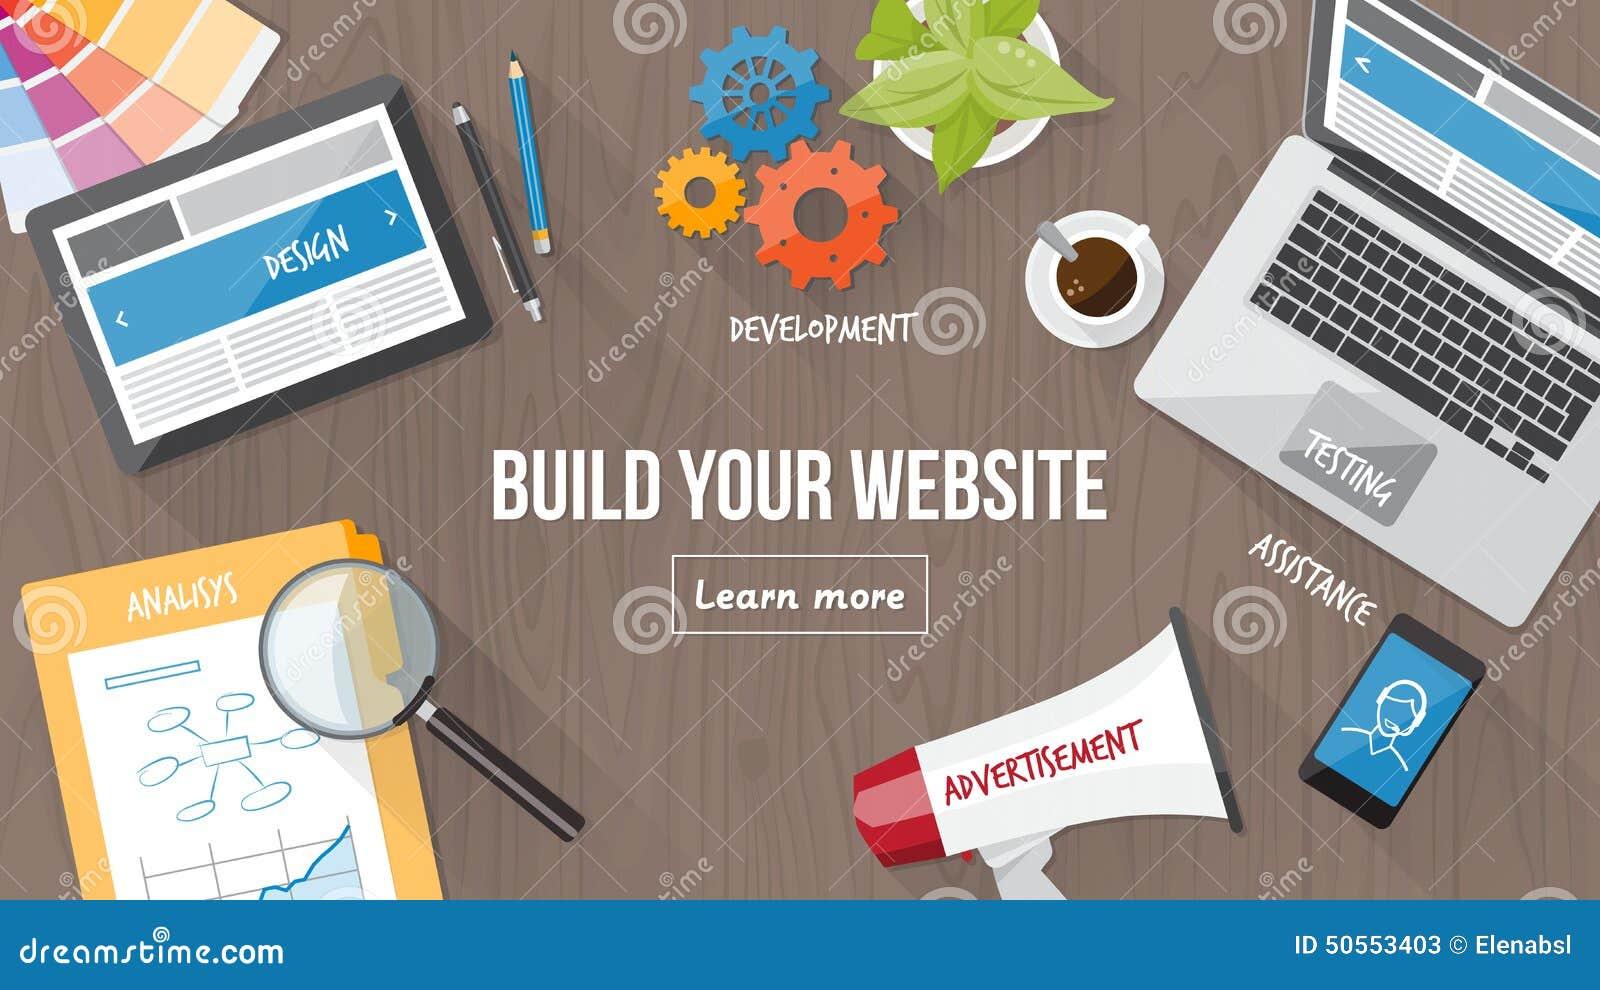 developer desk with computer, tablet and mobile, responsive web design